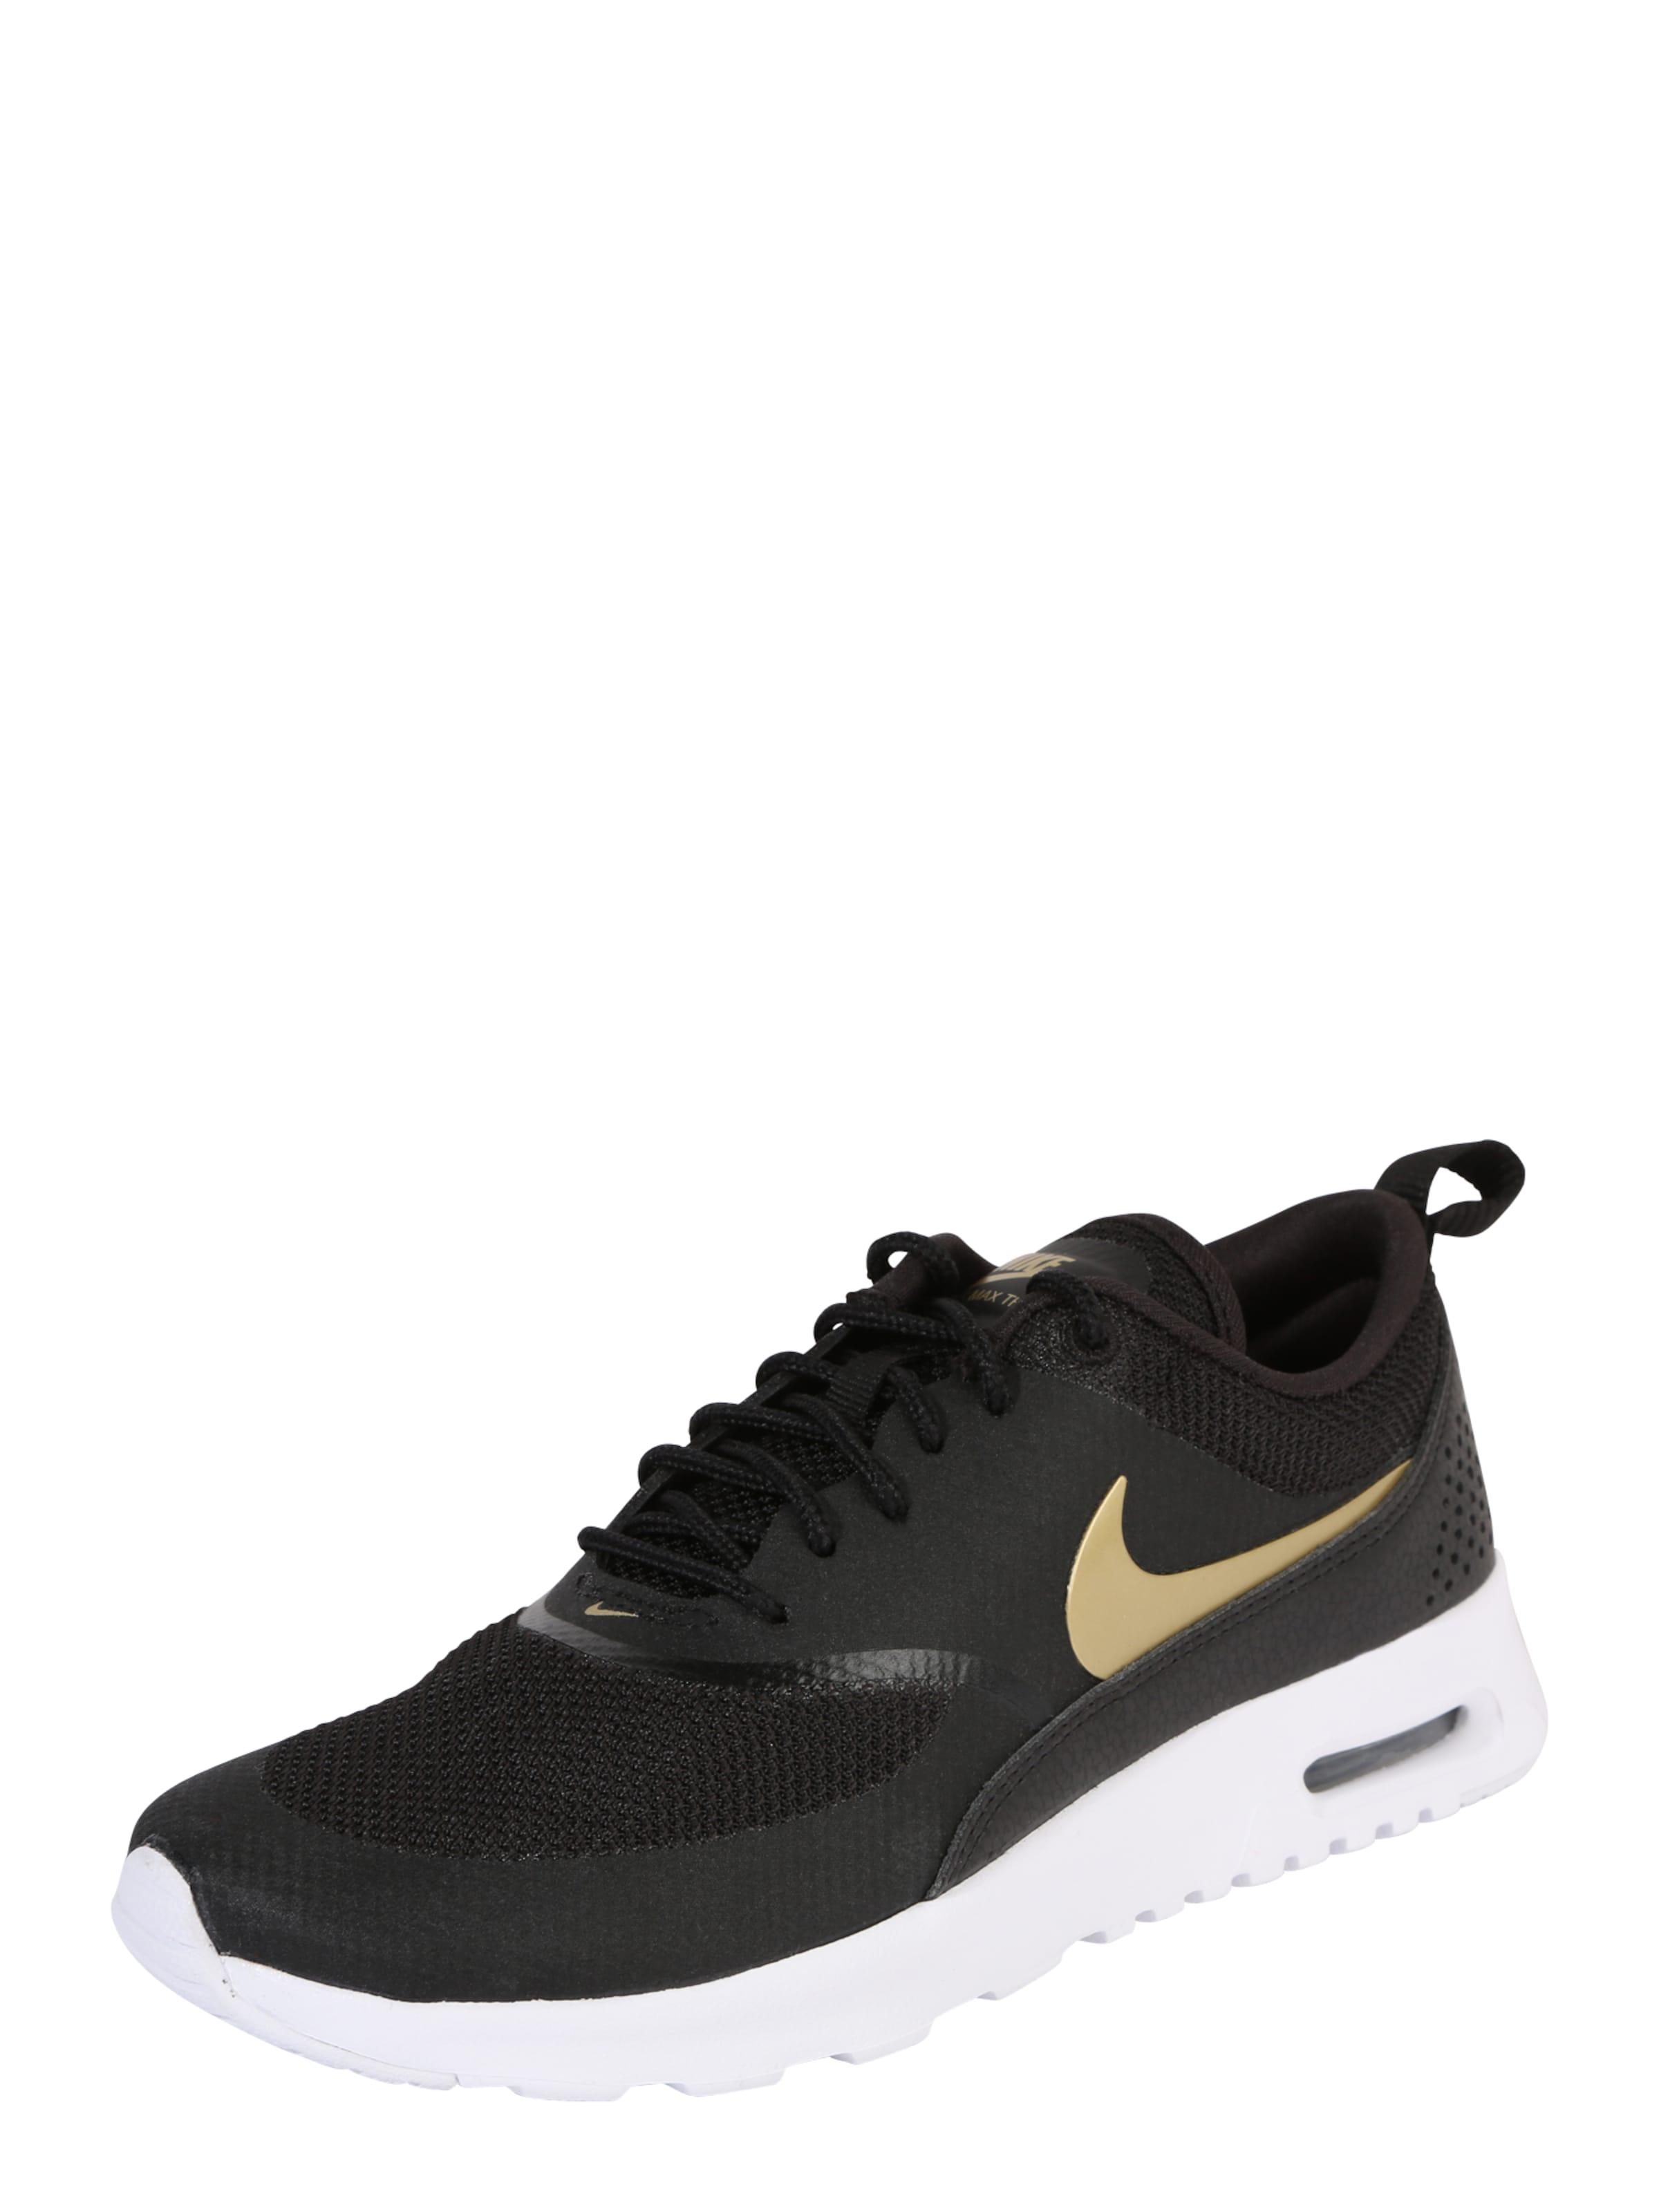 Nike Sneaker Frauen Air Max Thea J in schwarz Große